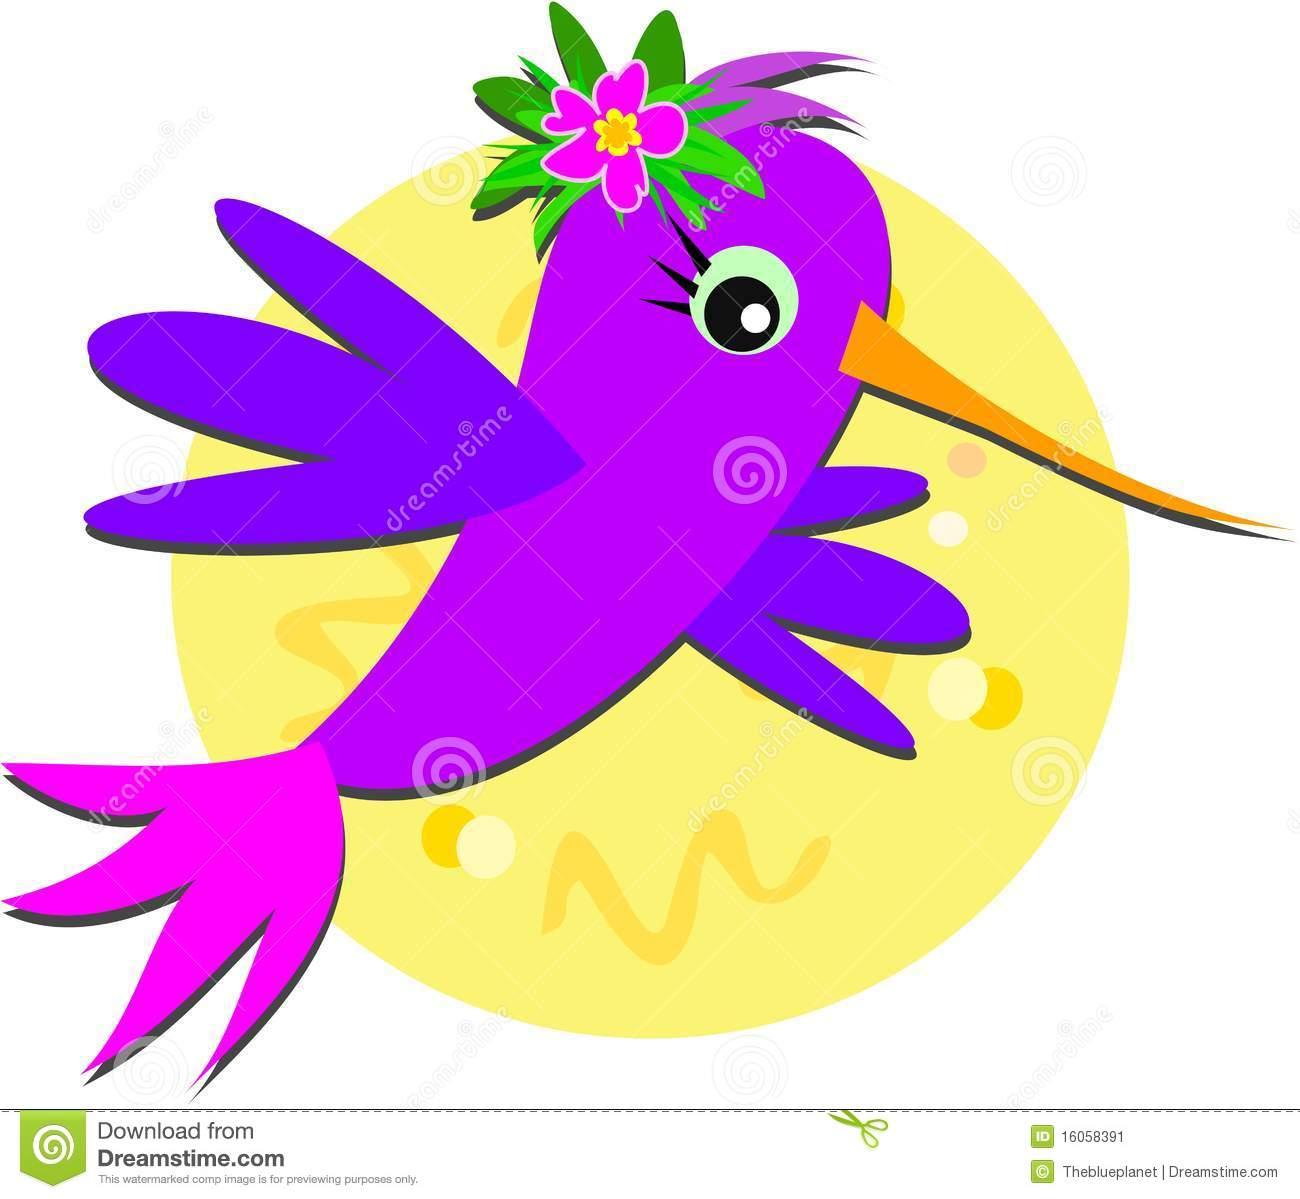 Pink clipart hummingbird Hummingbird And Clipart cliparts Hummingbird